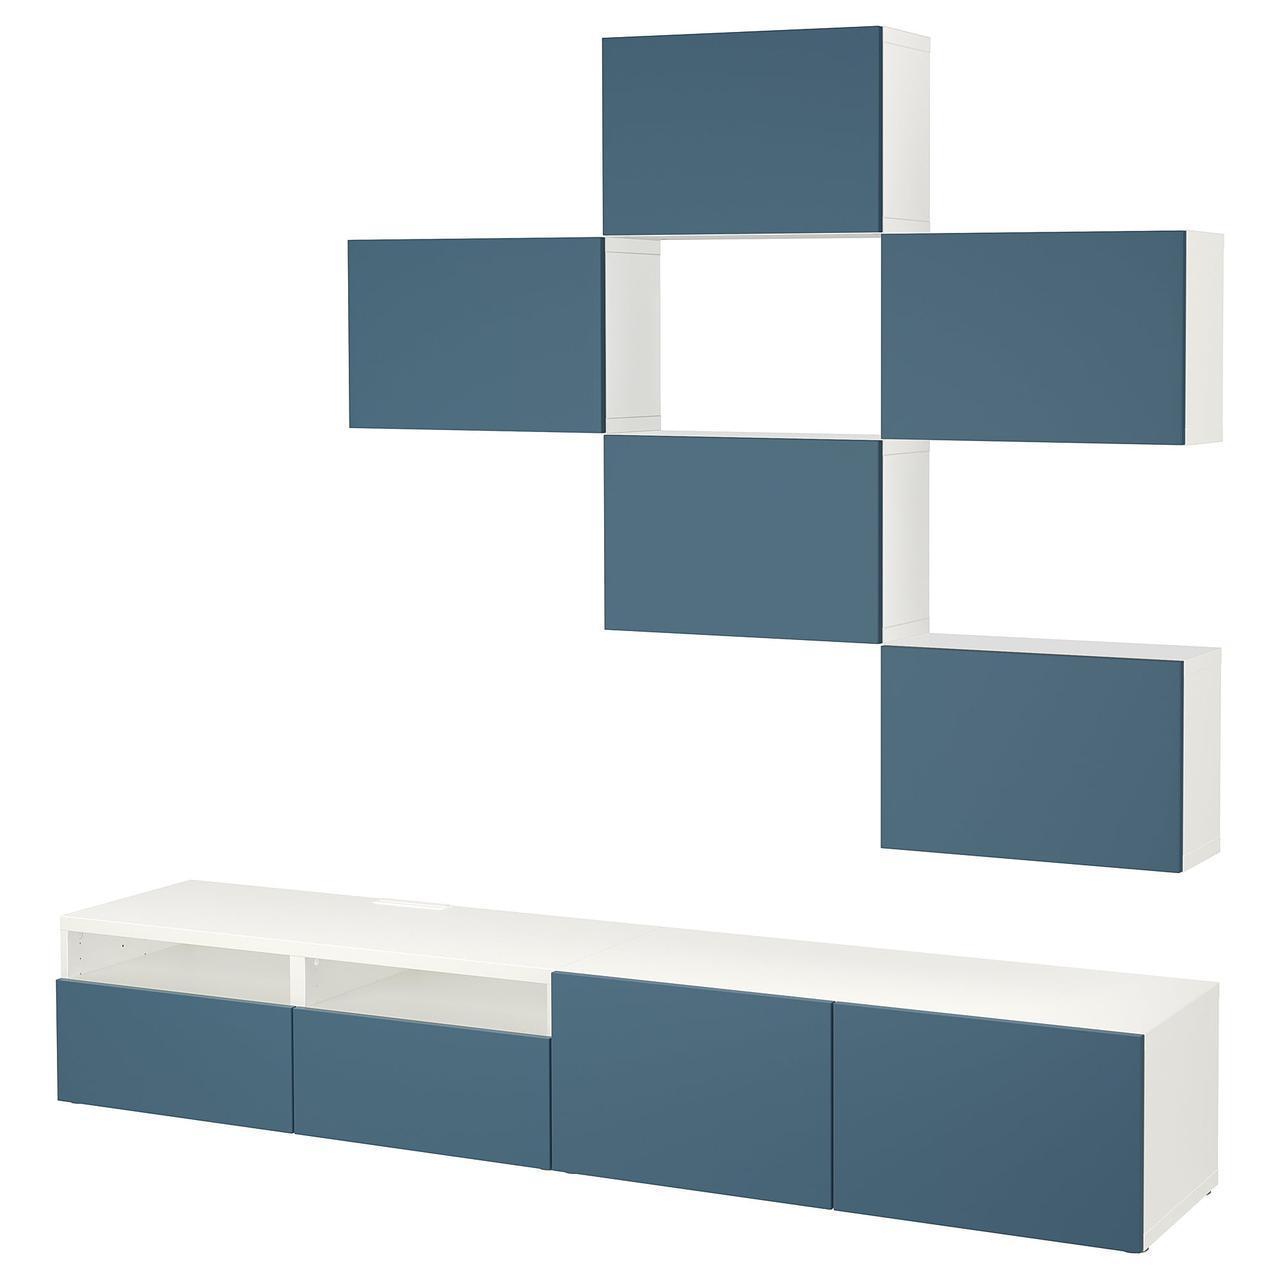 IKEA BESTA Тумба под телевизор, белый, Вальвикен синий  (992.021.03)